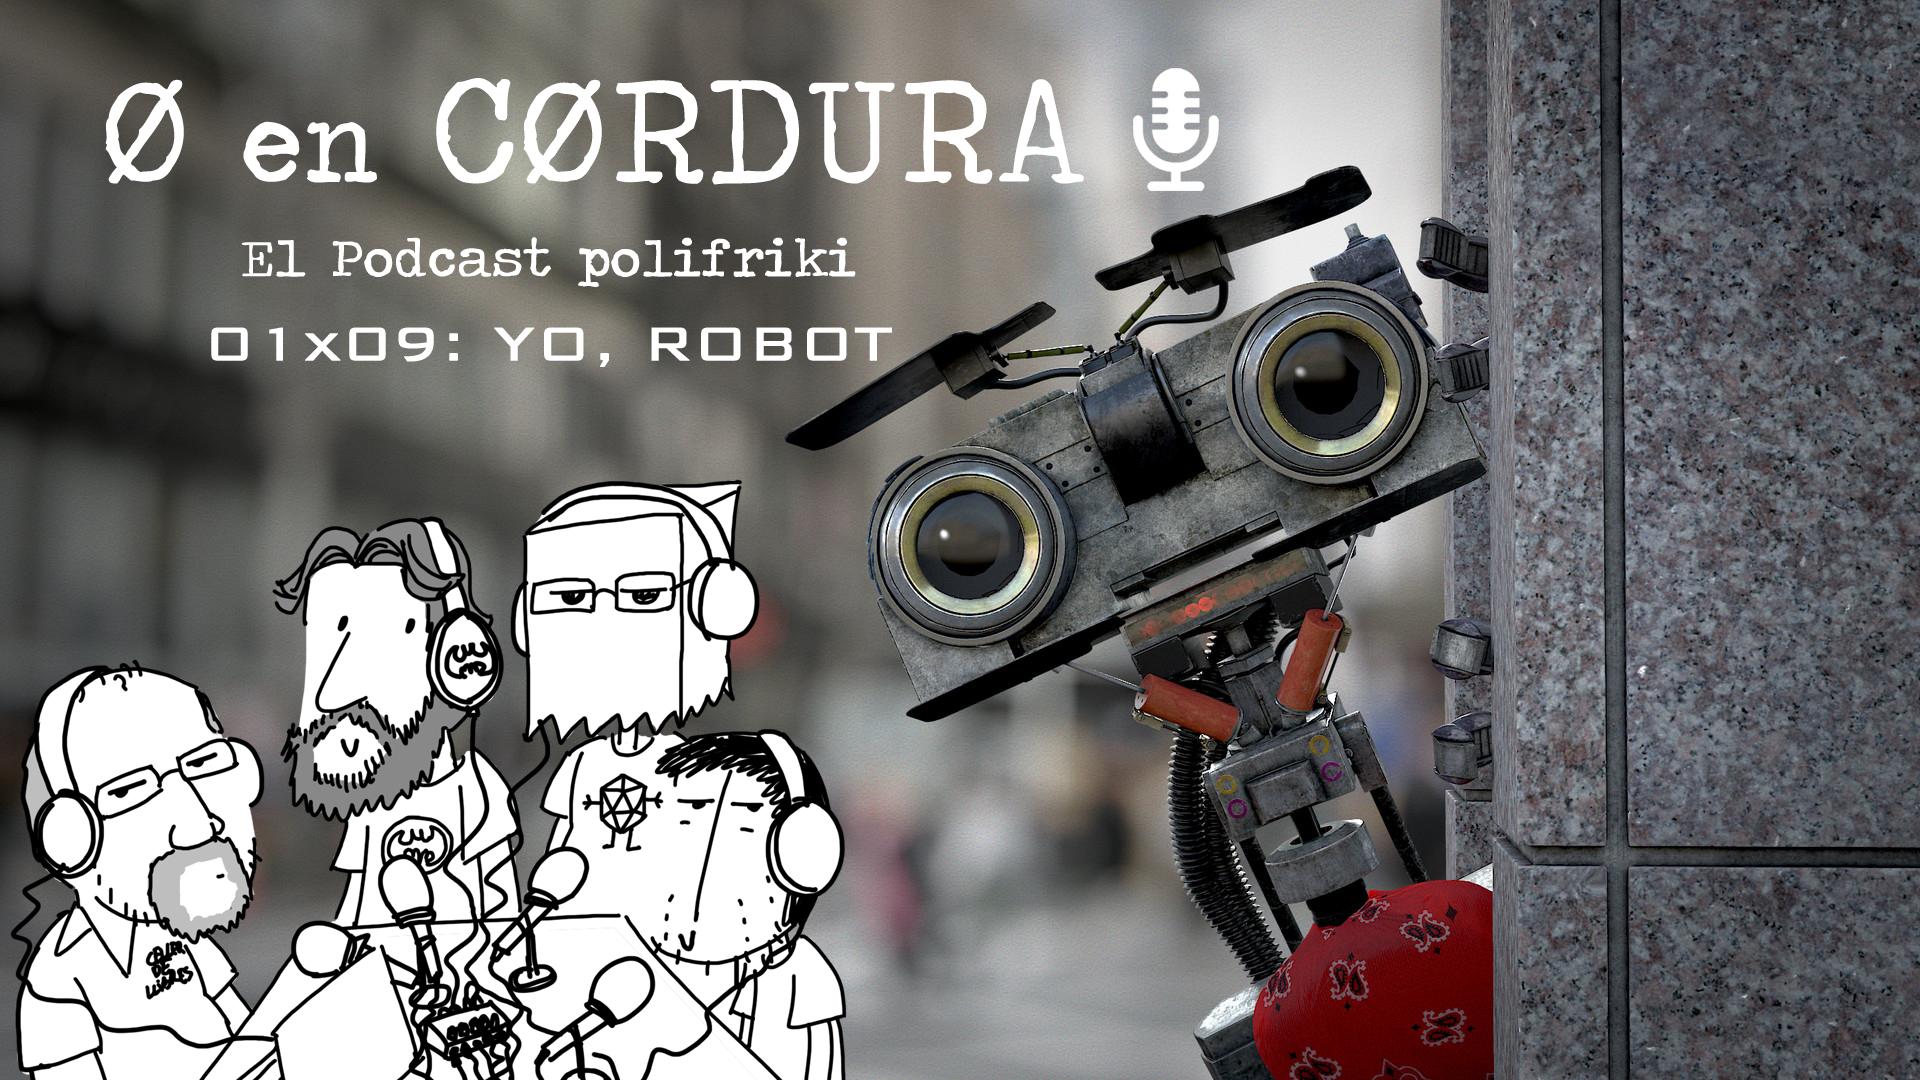 Podcast Cero en Cordura 1x09 YO, ROBOT